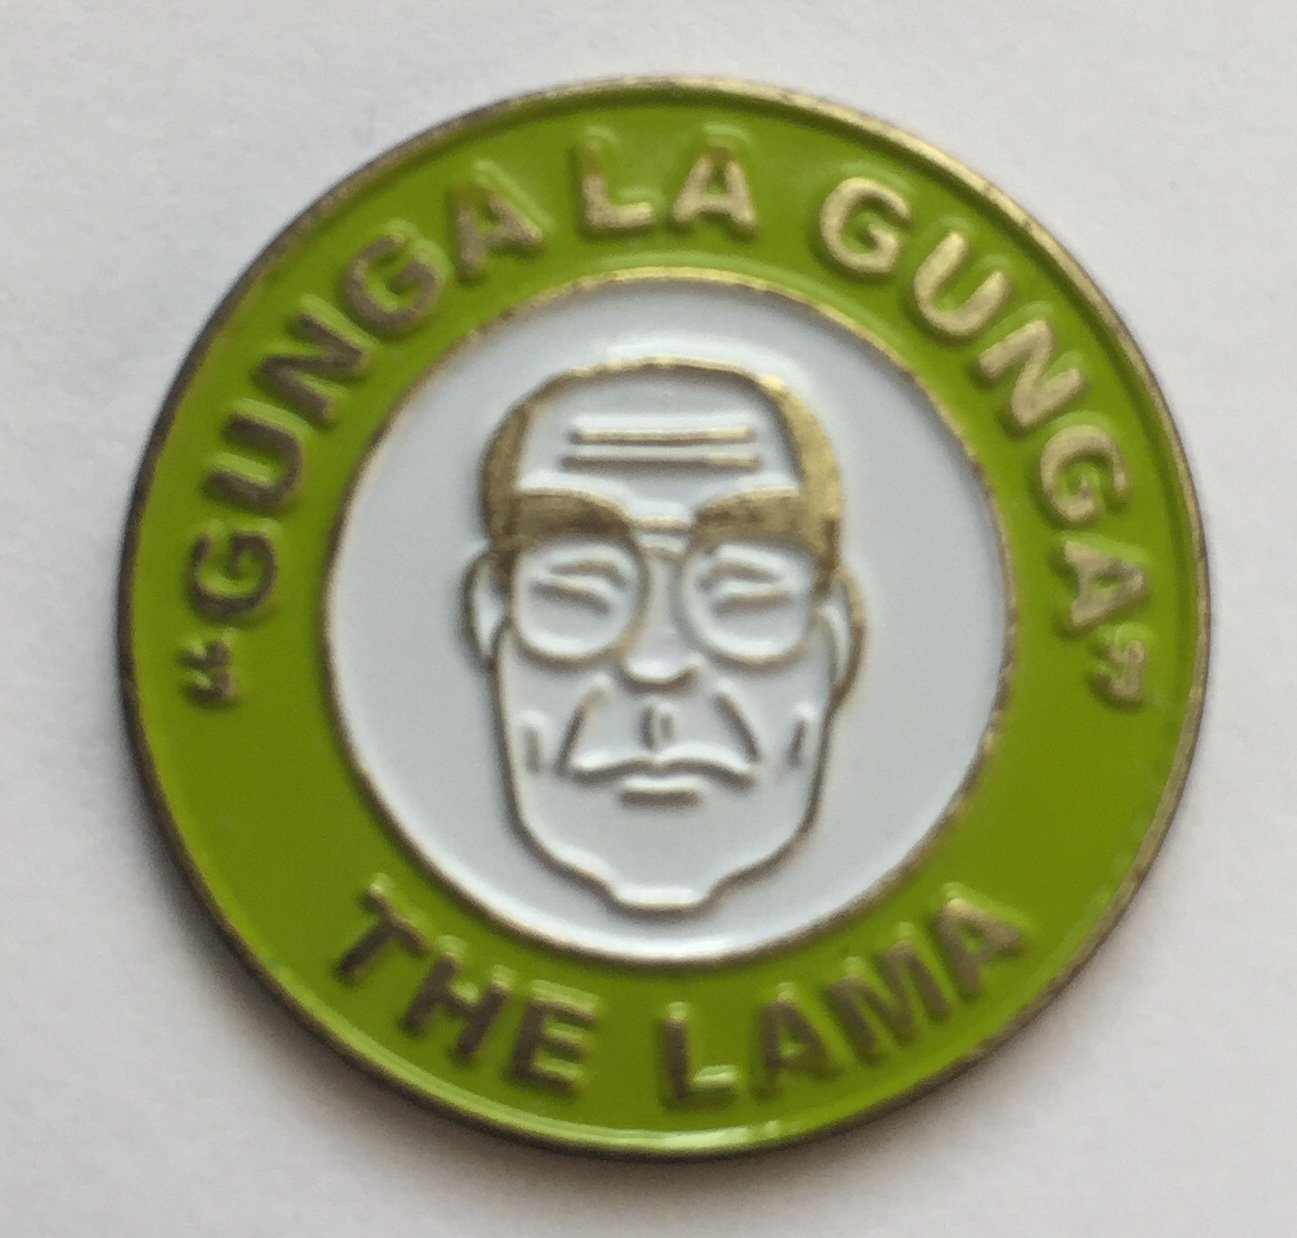 Evergolf Gunga La Gunga Caddyshack The Lama Golf Ball Marker   B07FBYX85F